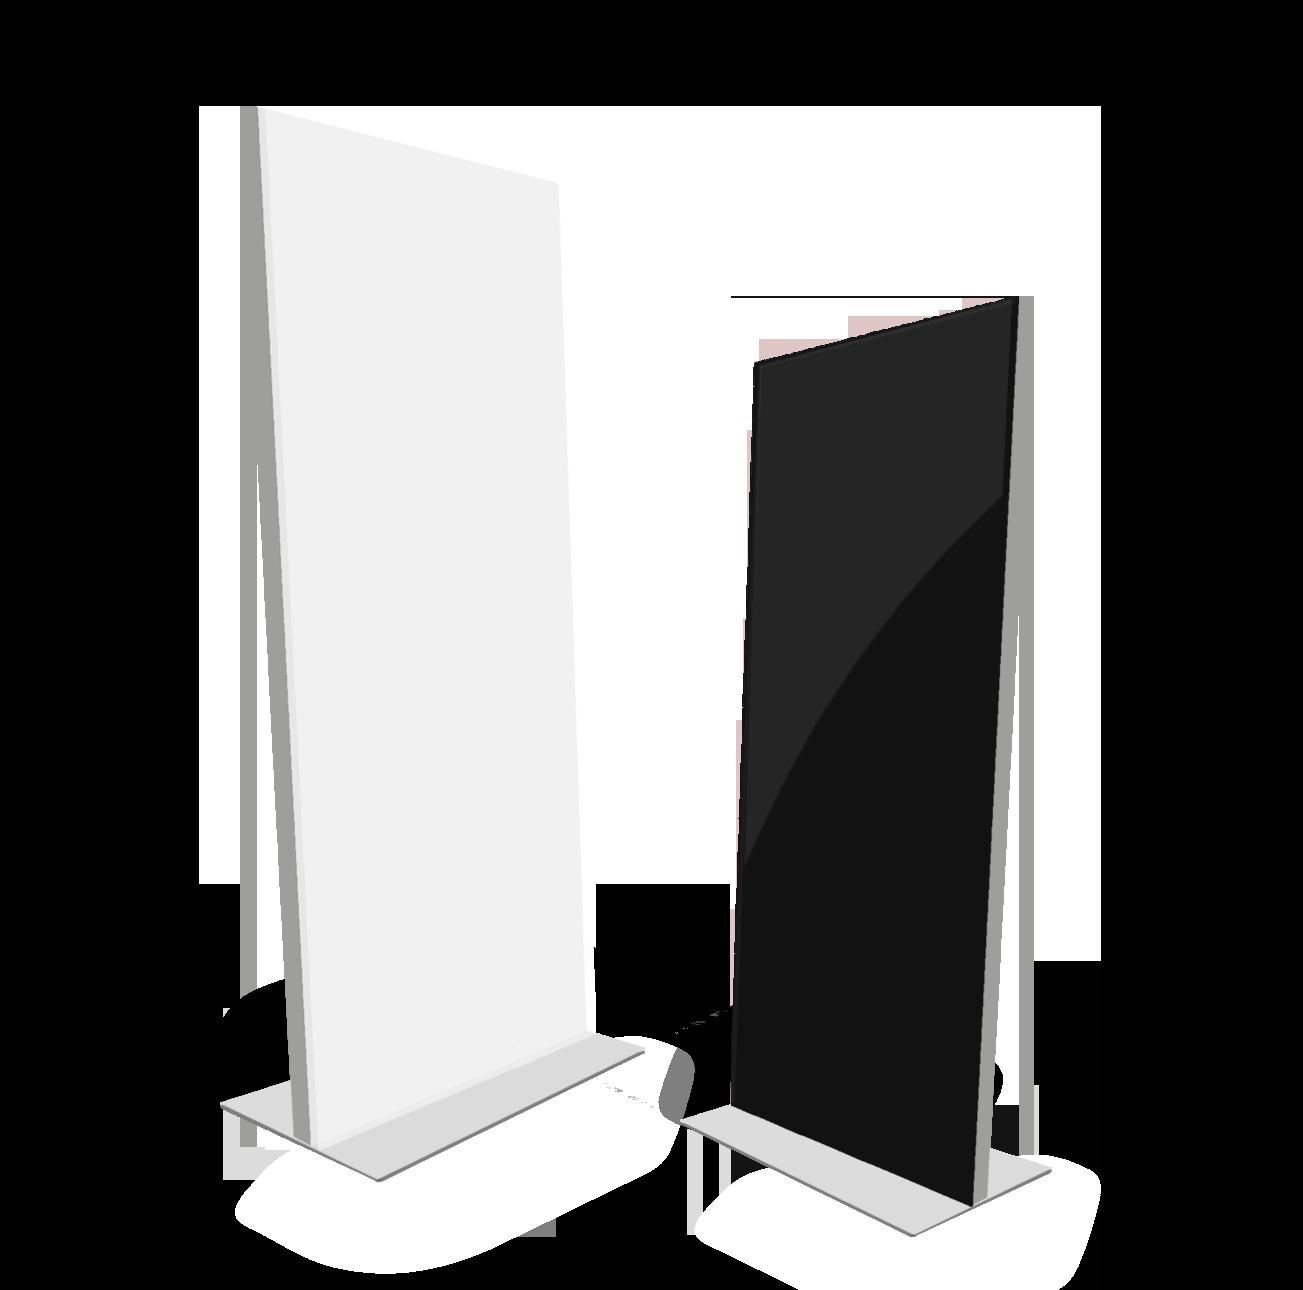 modulaire-standenbouw-frameworks-systeem-standaard-wall